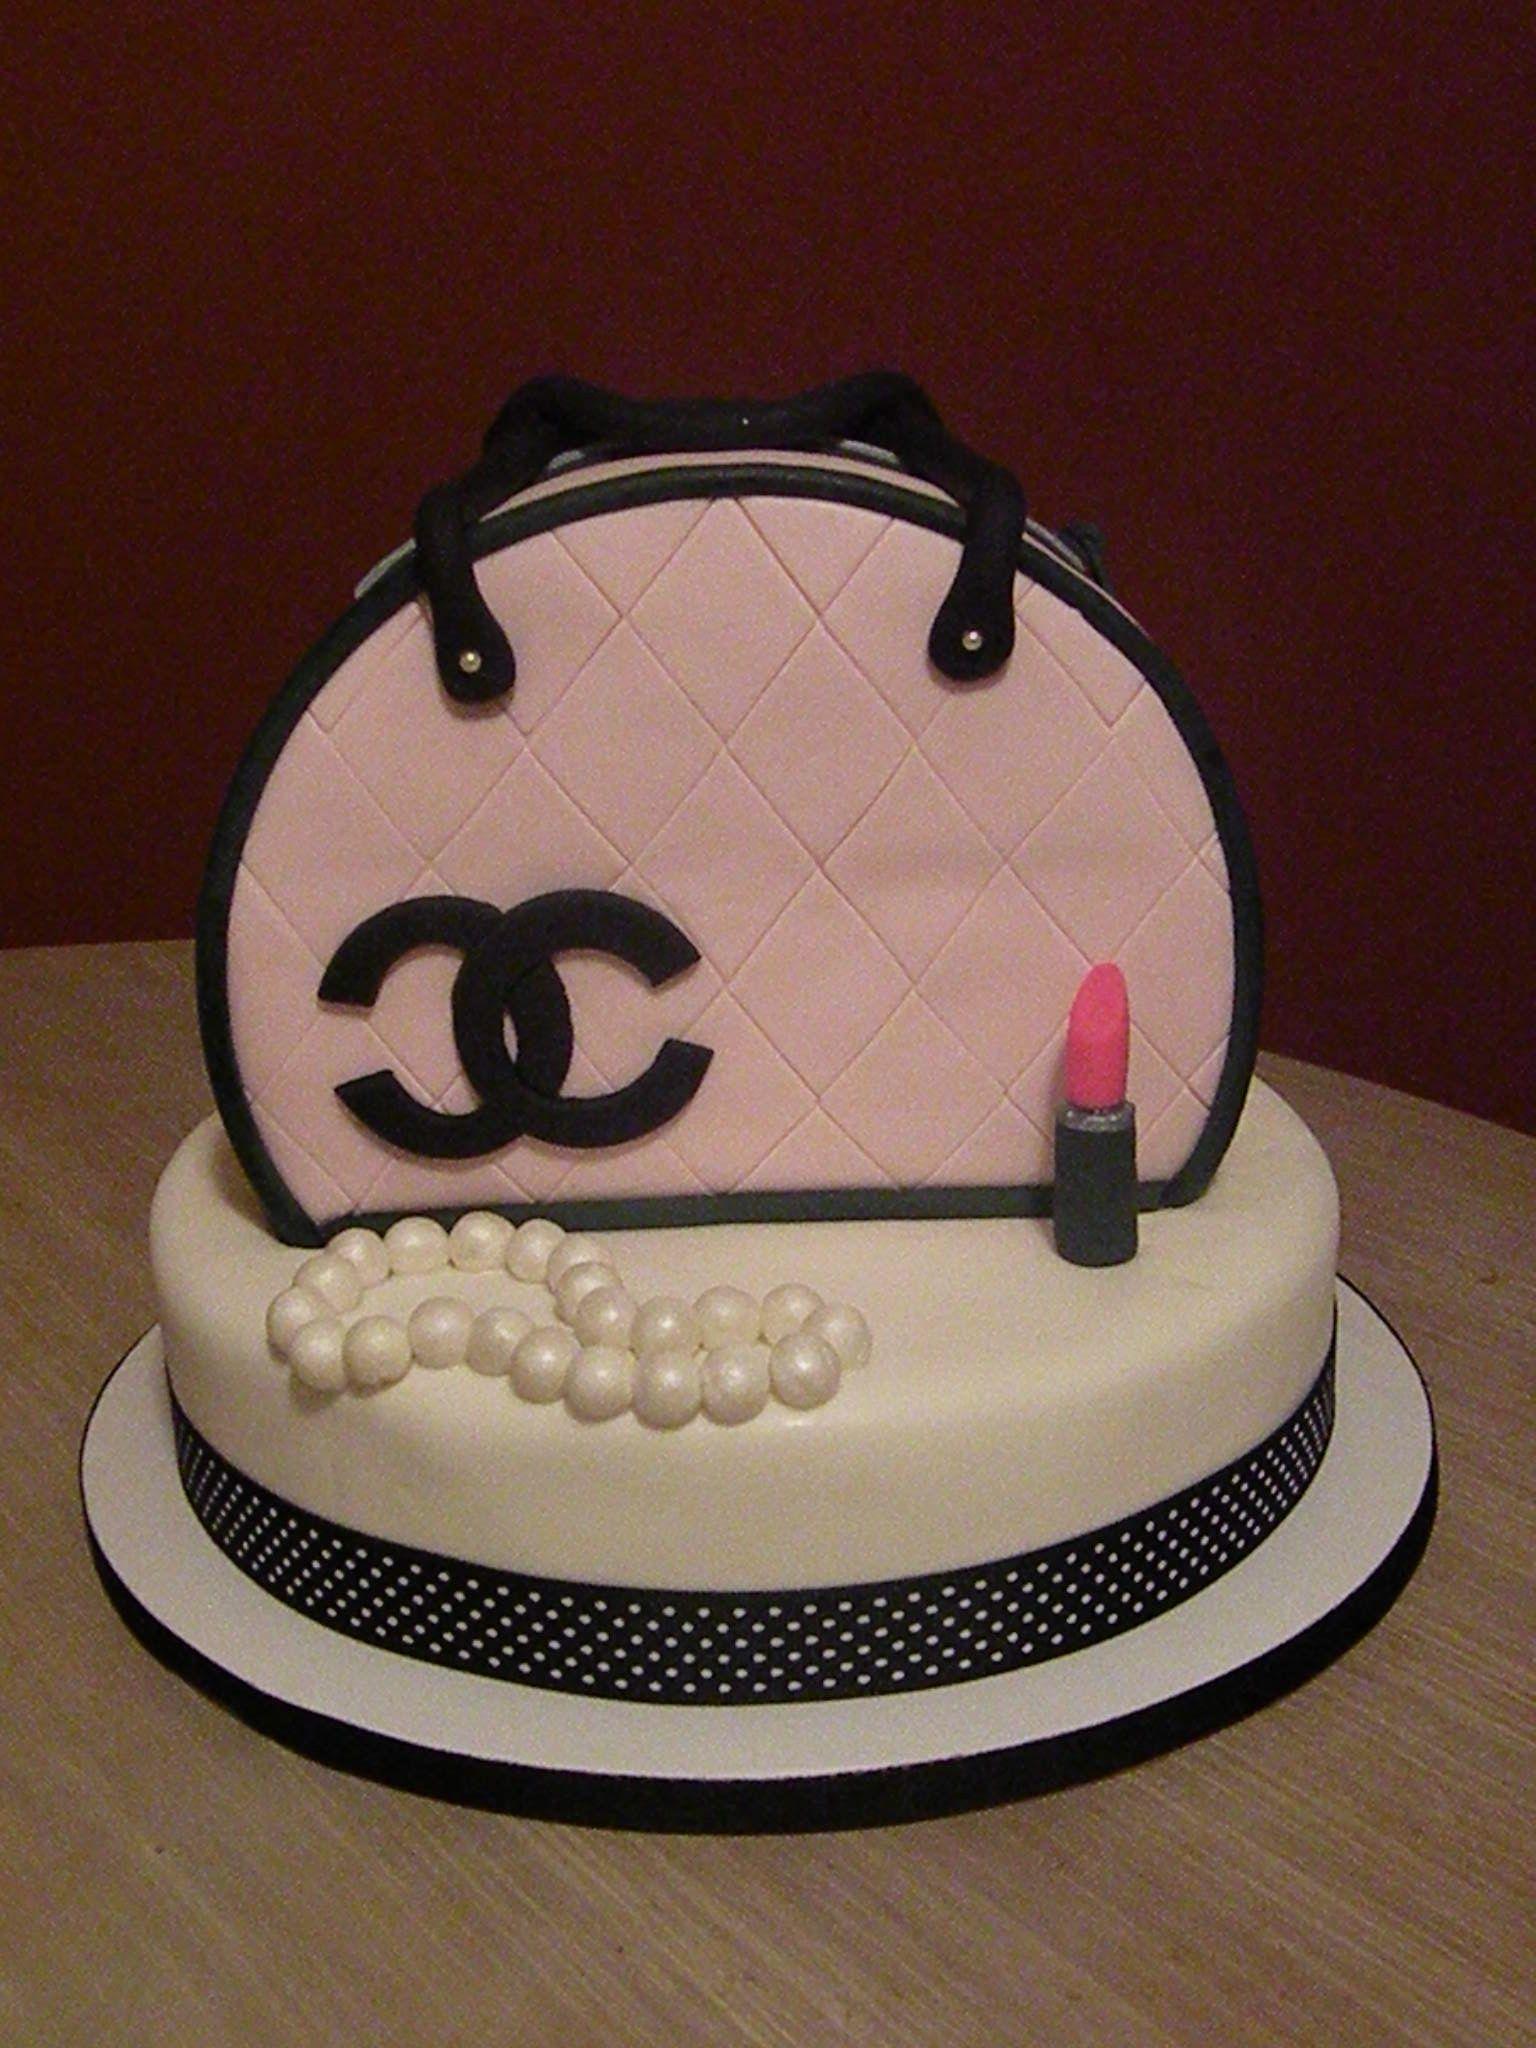 Pink   Black Chanel purse cake - my first purse cake!  a7fb044252513